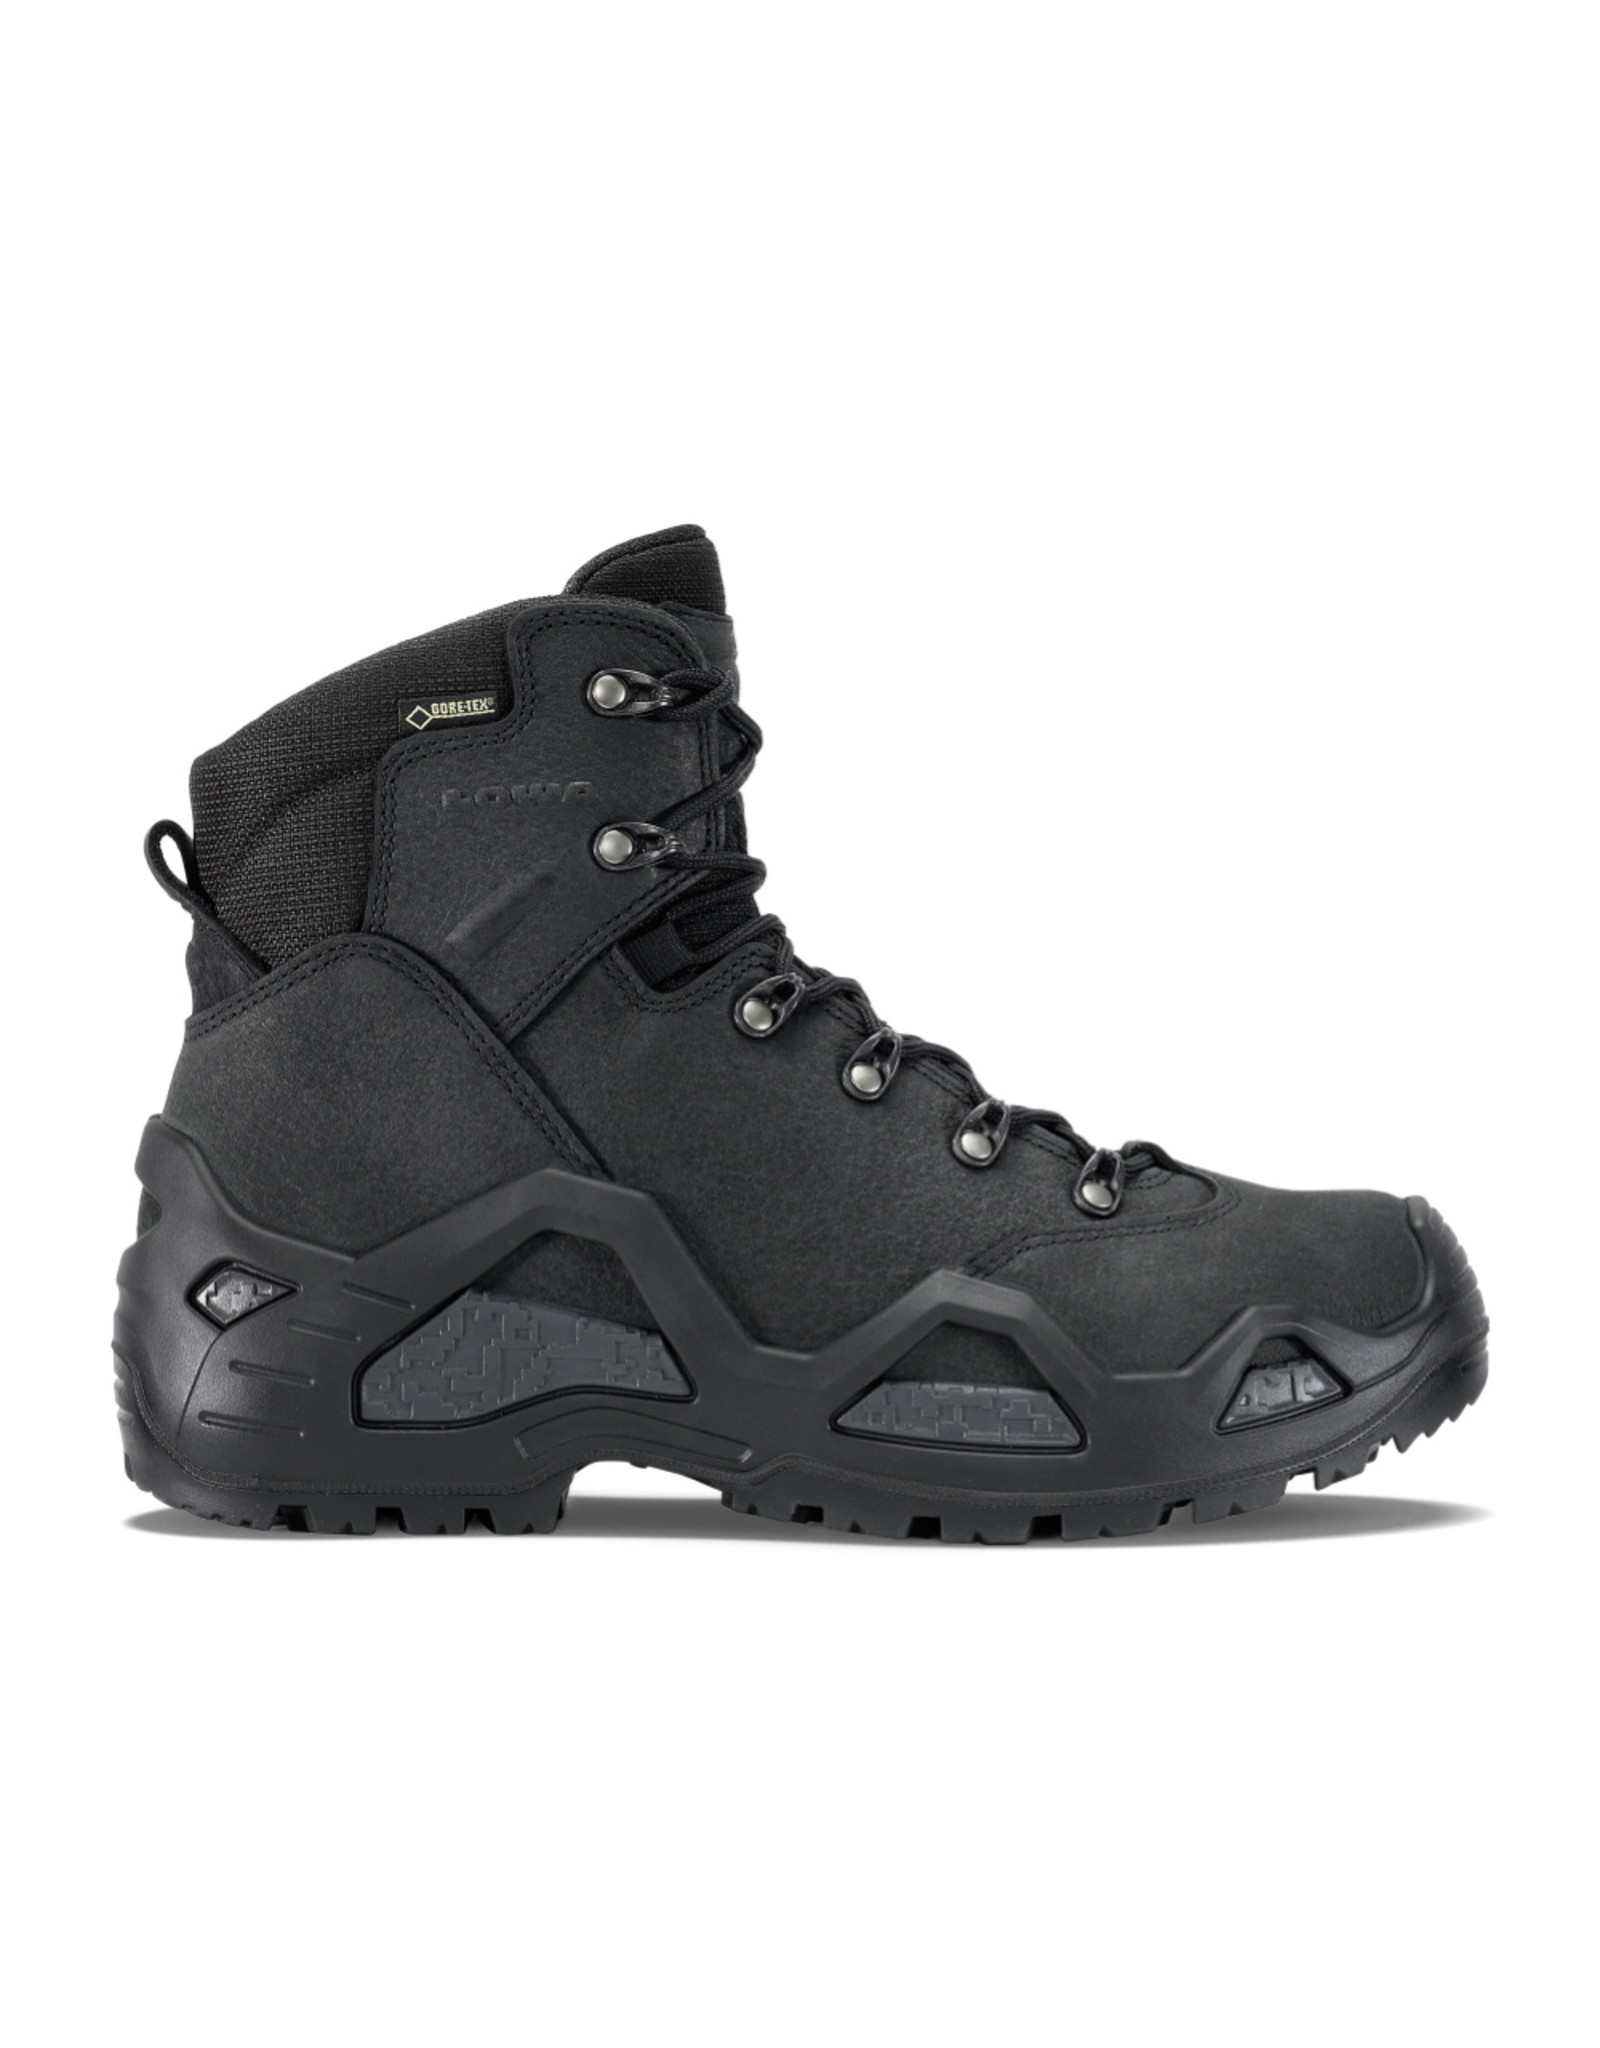 Men Z-6N GTX Boot 15